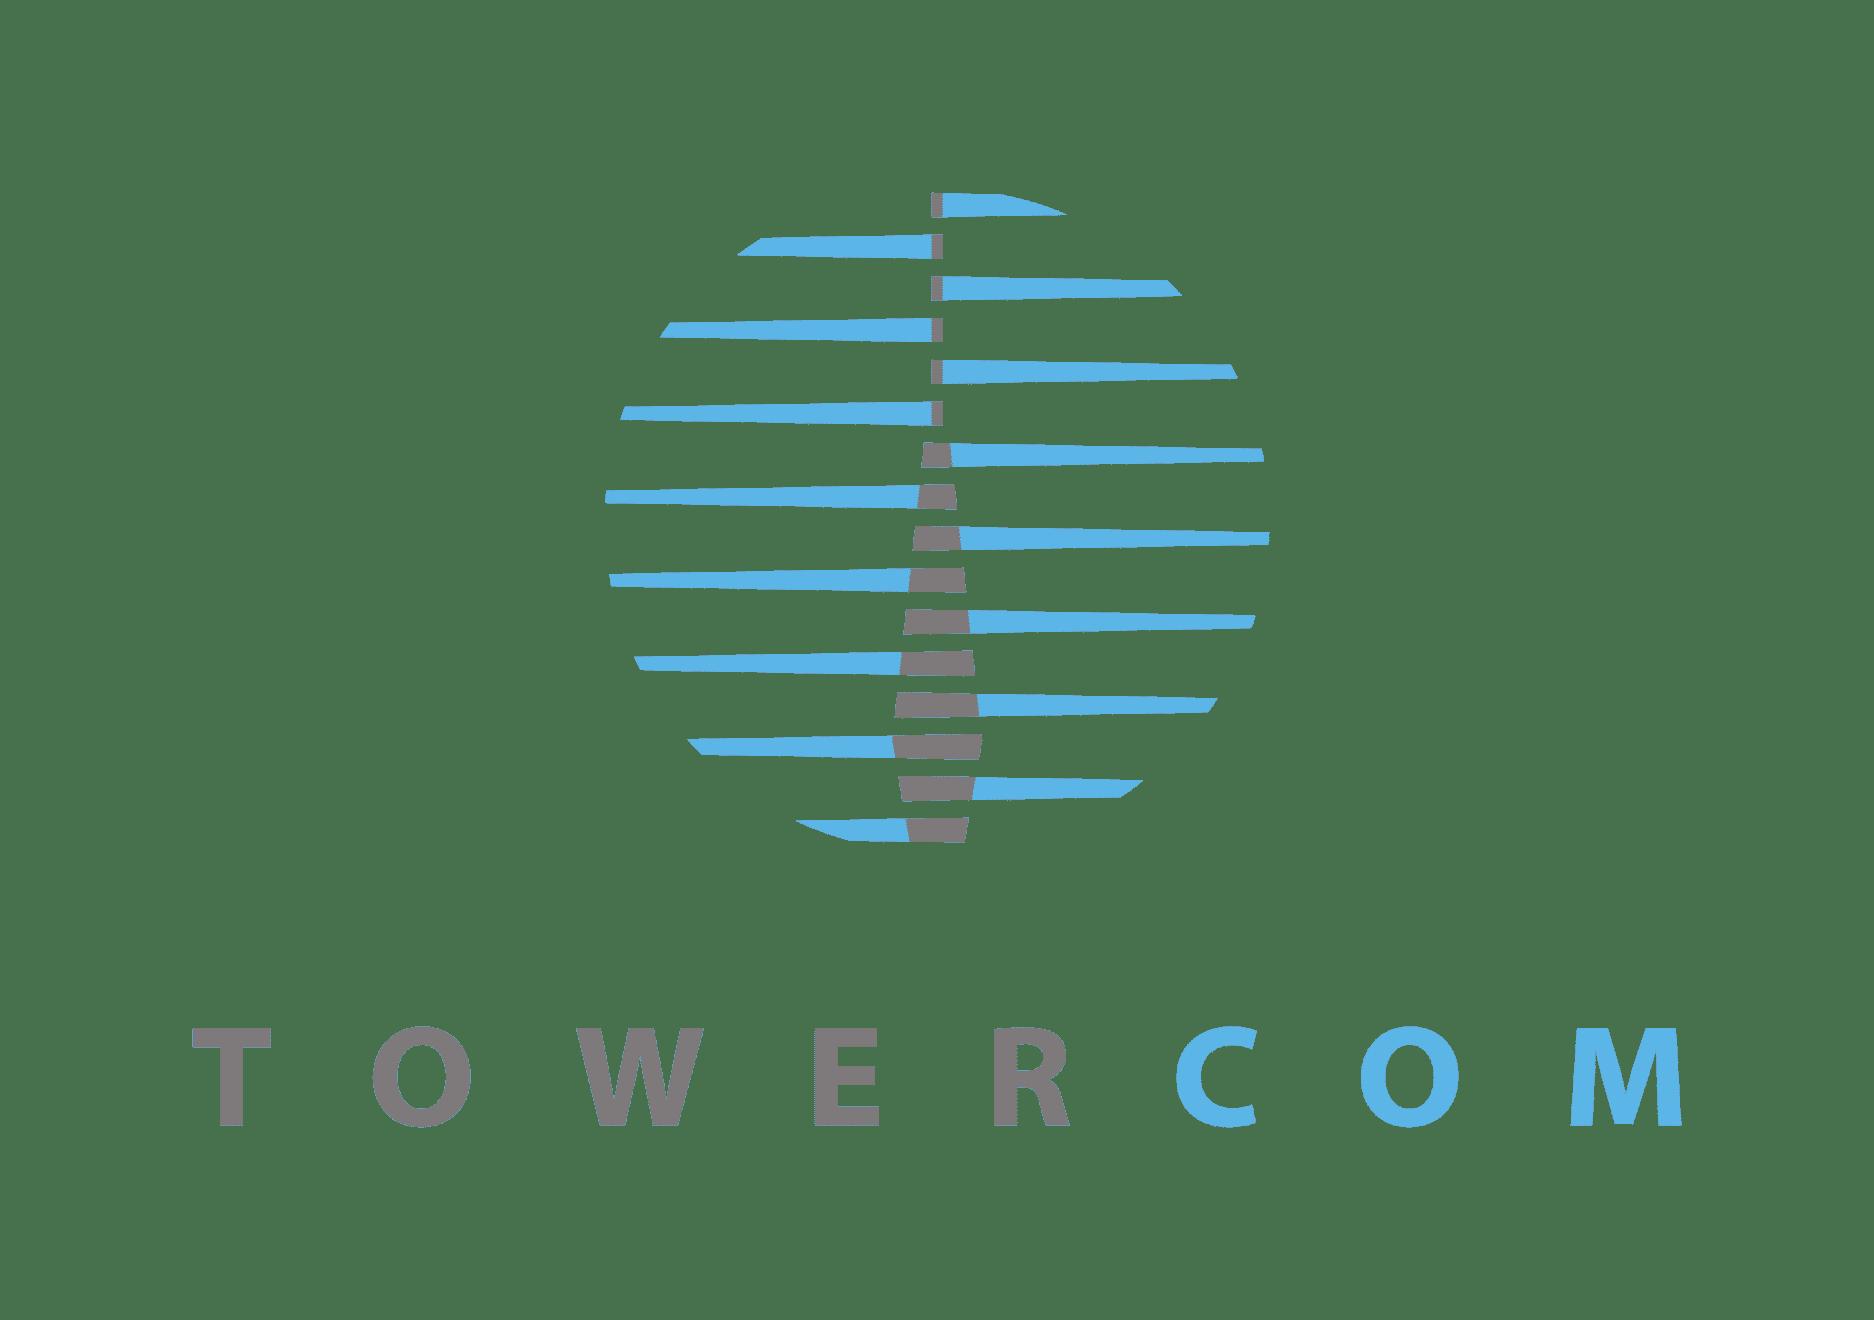 logo_towercom